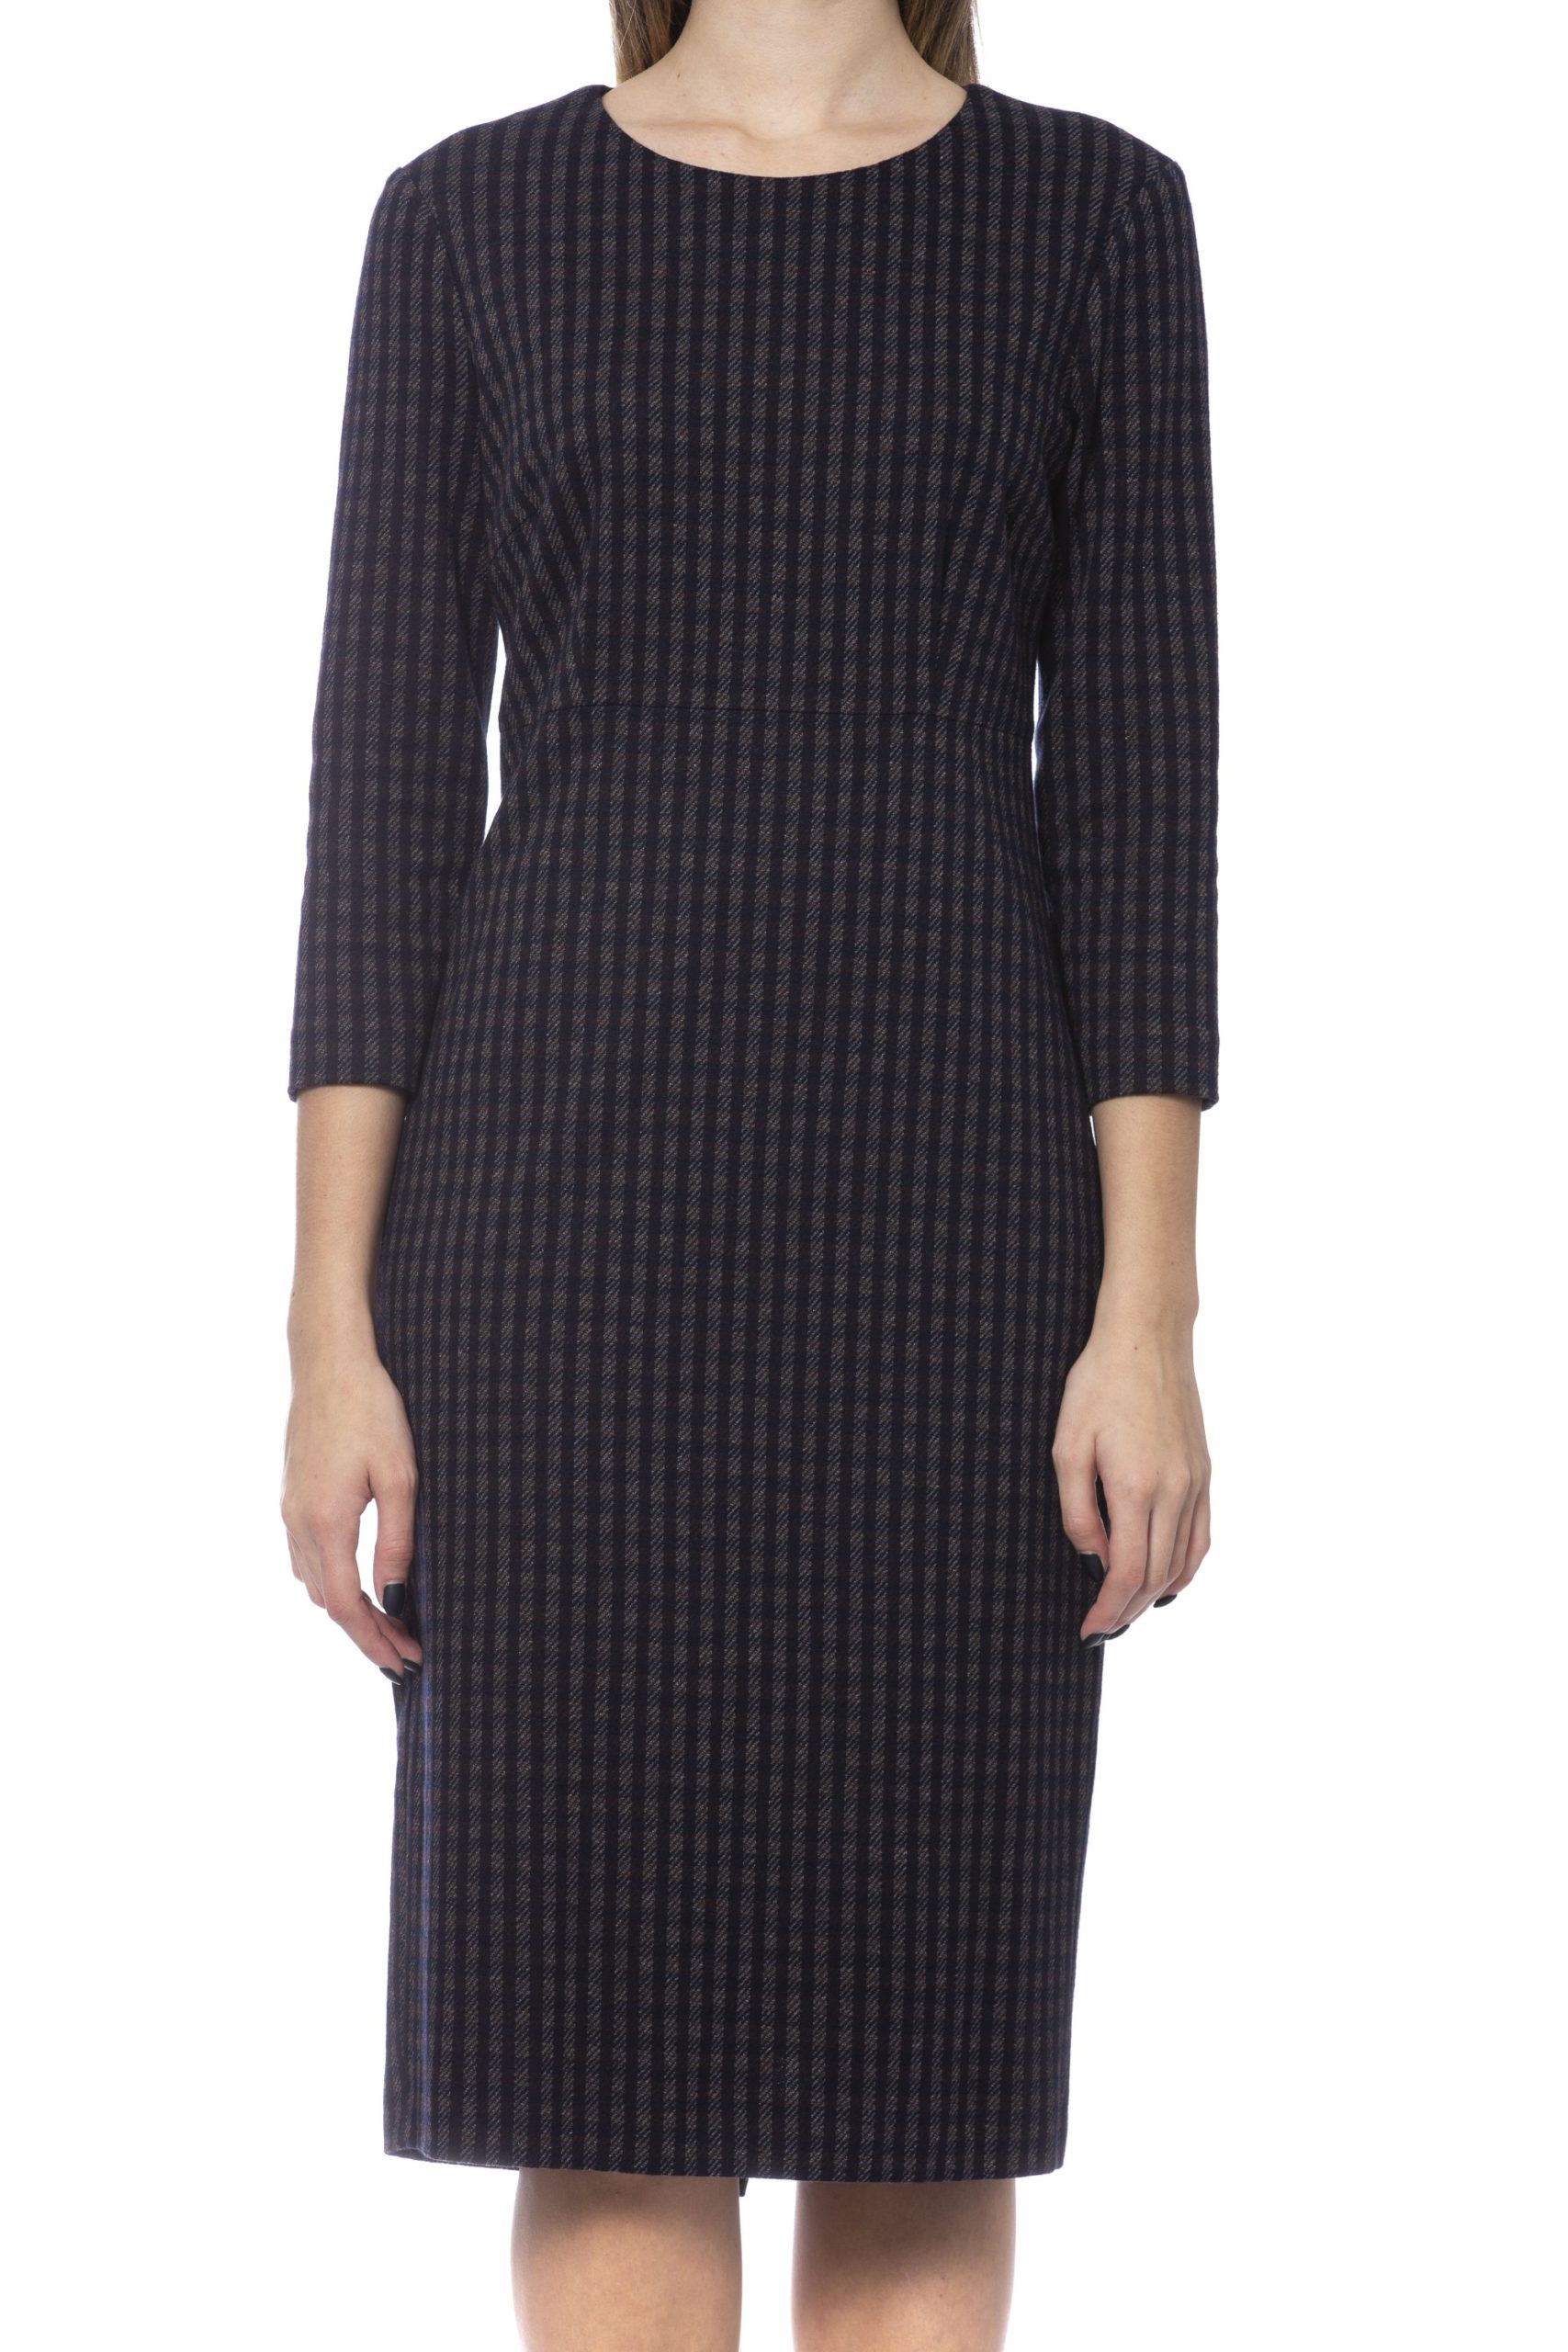 Peserico Women's Dress Blue PE992134 - IT42 | S